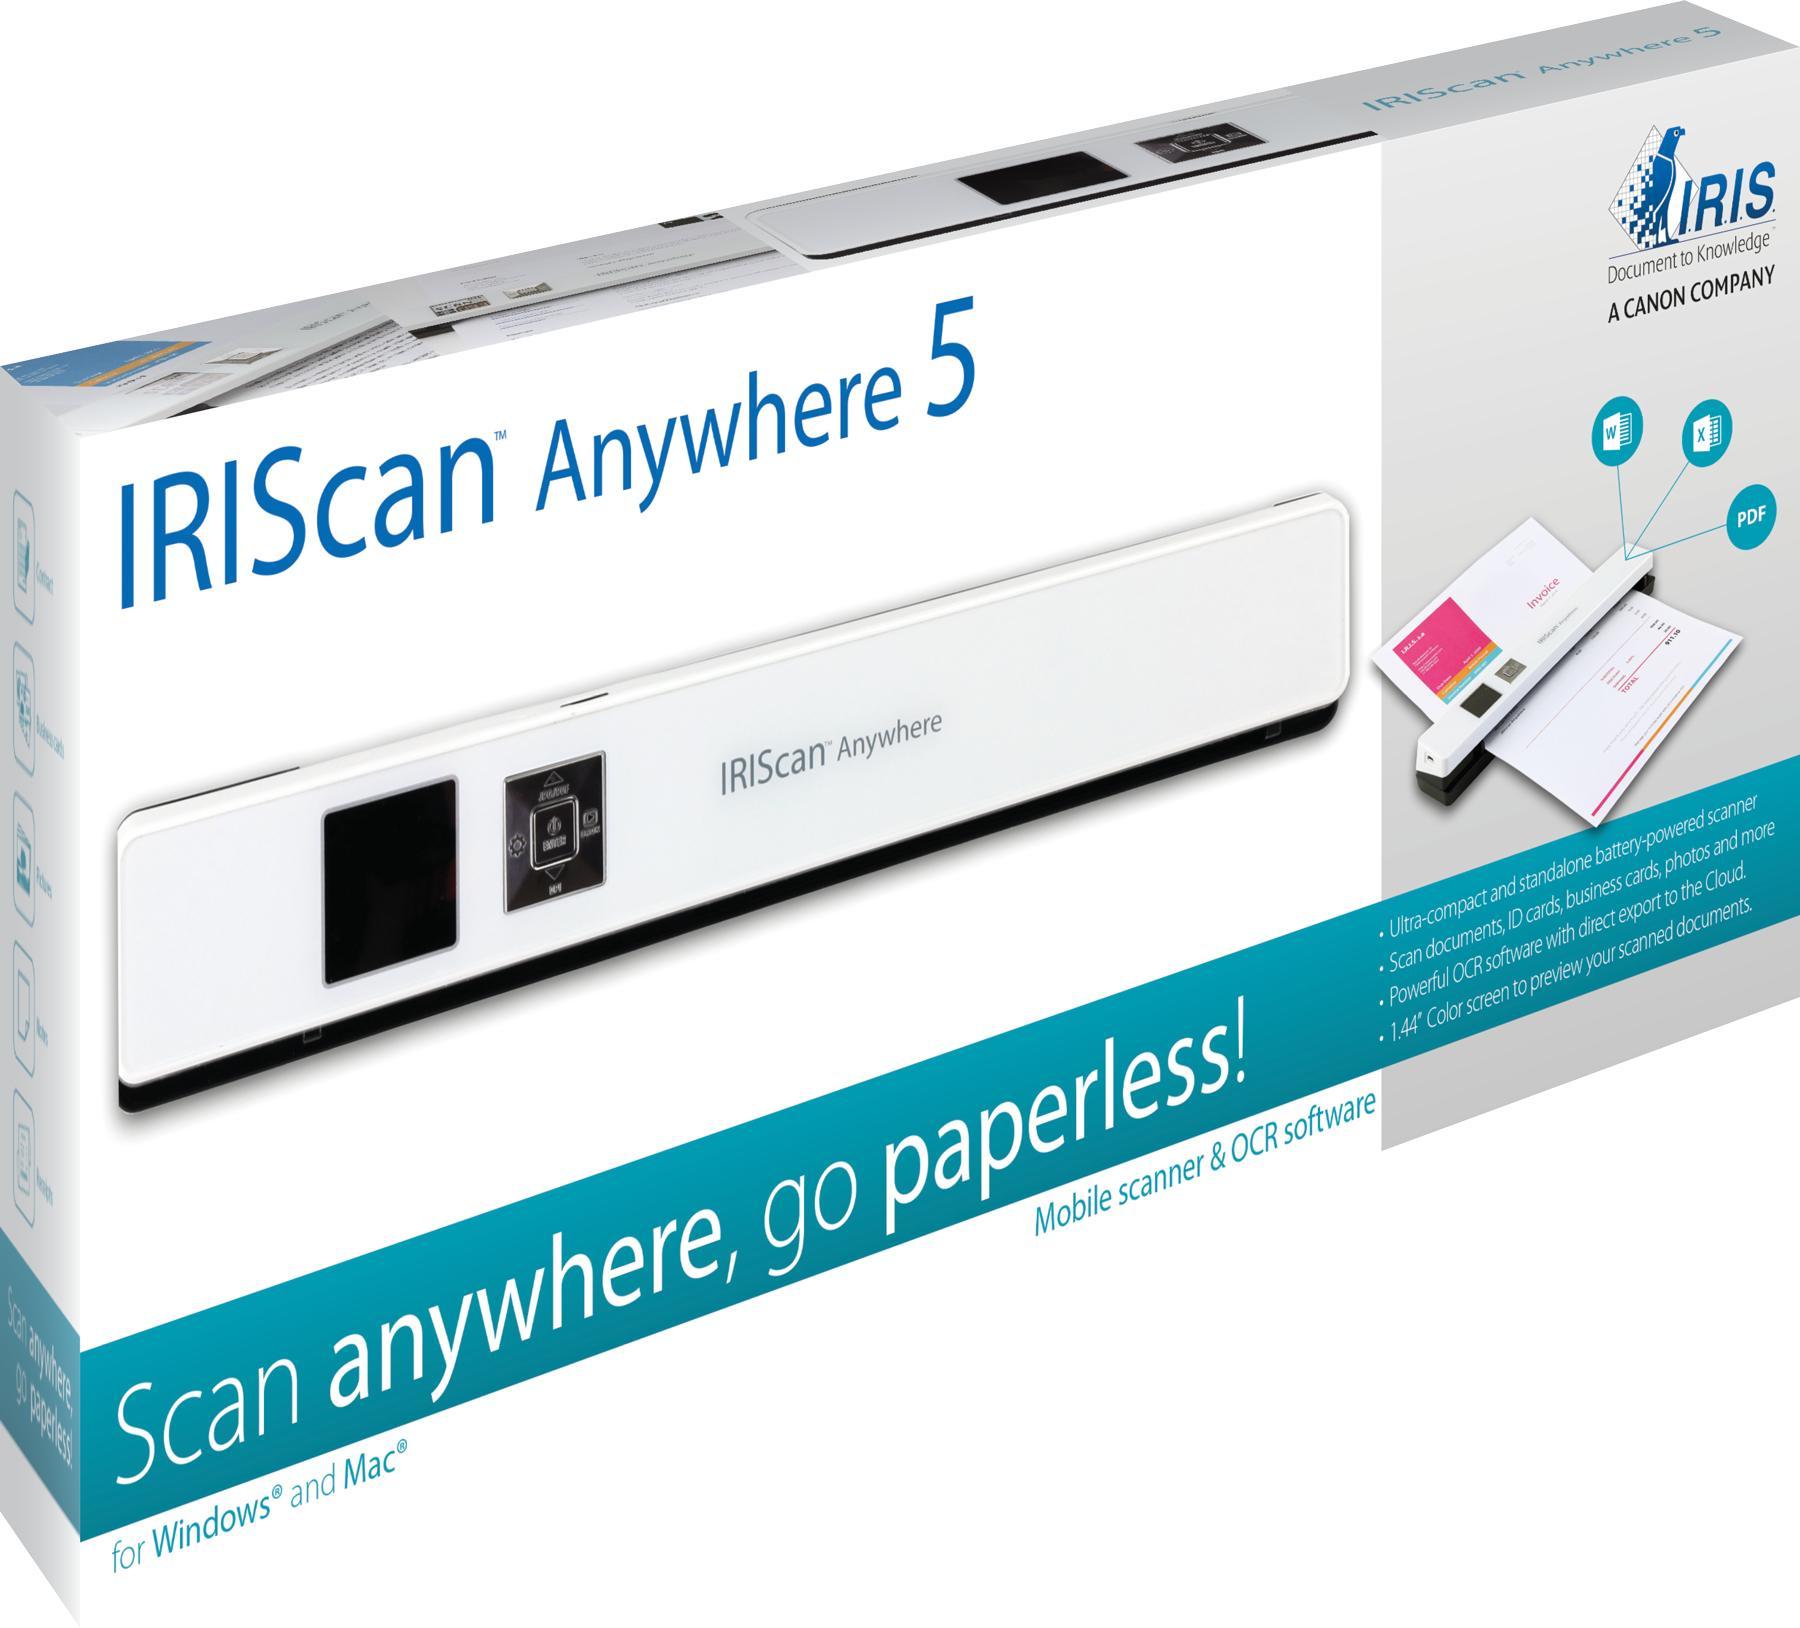 Scanner IRIS IRIS 458844